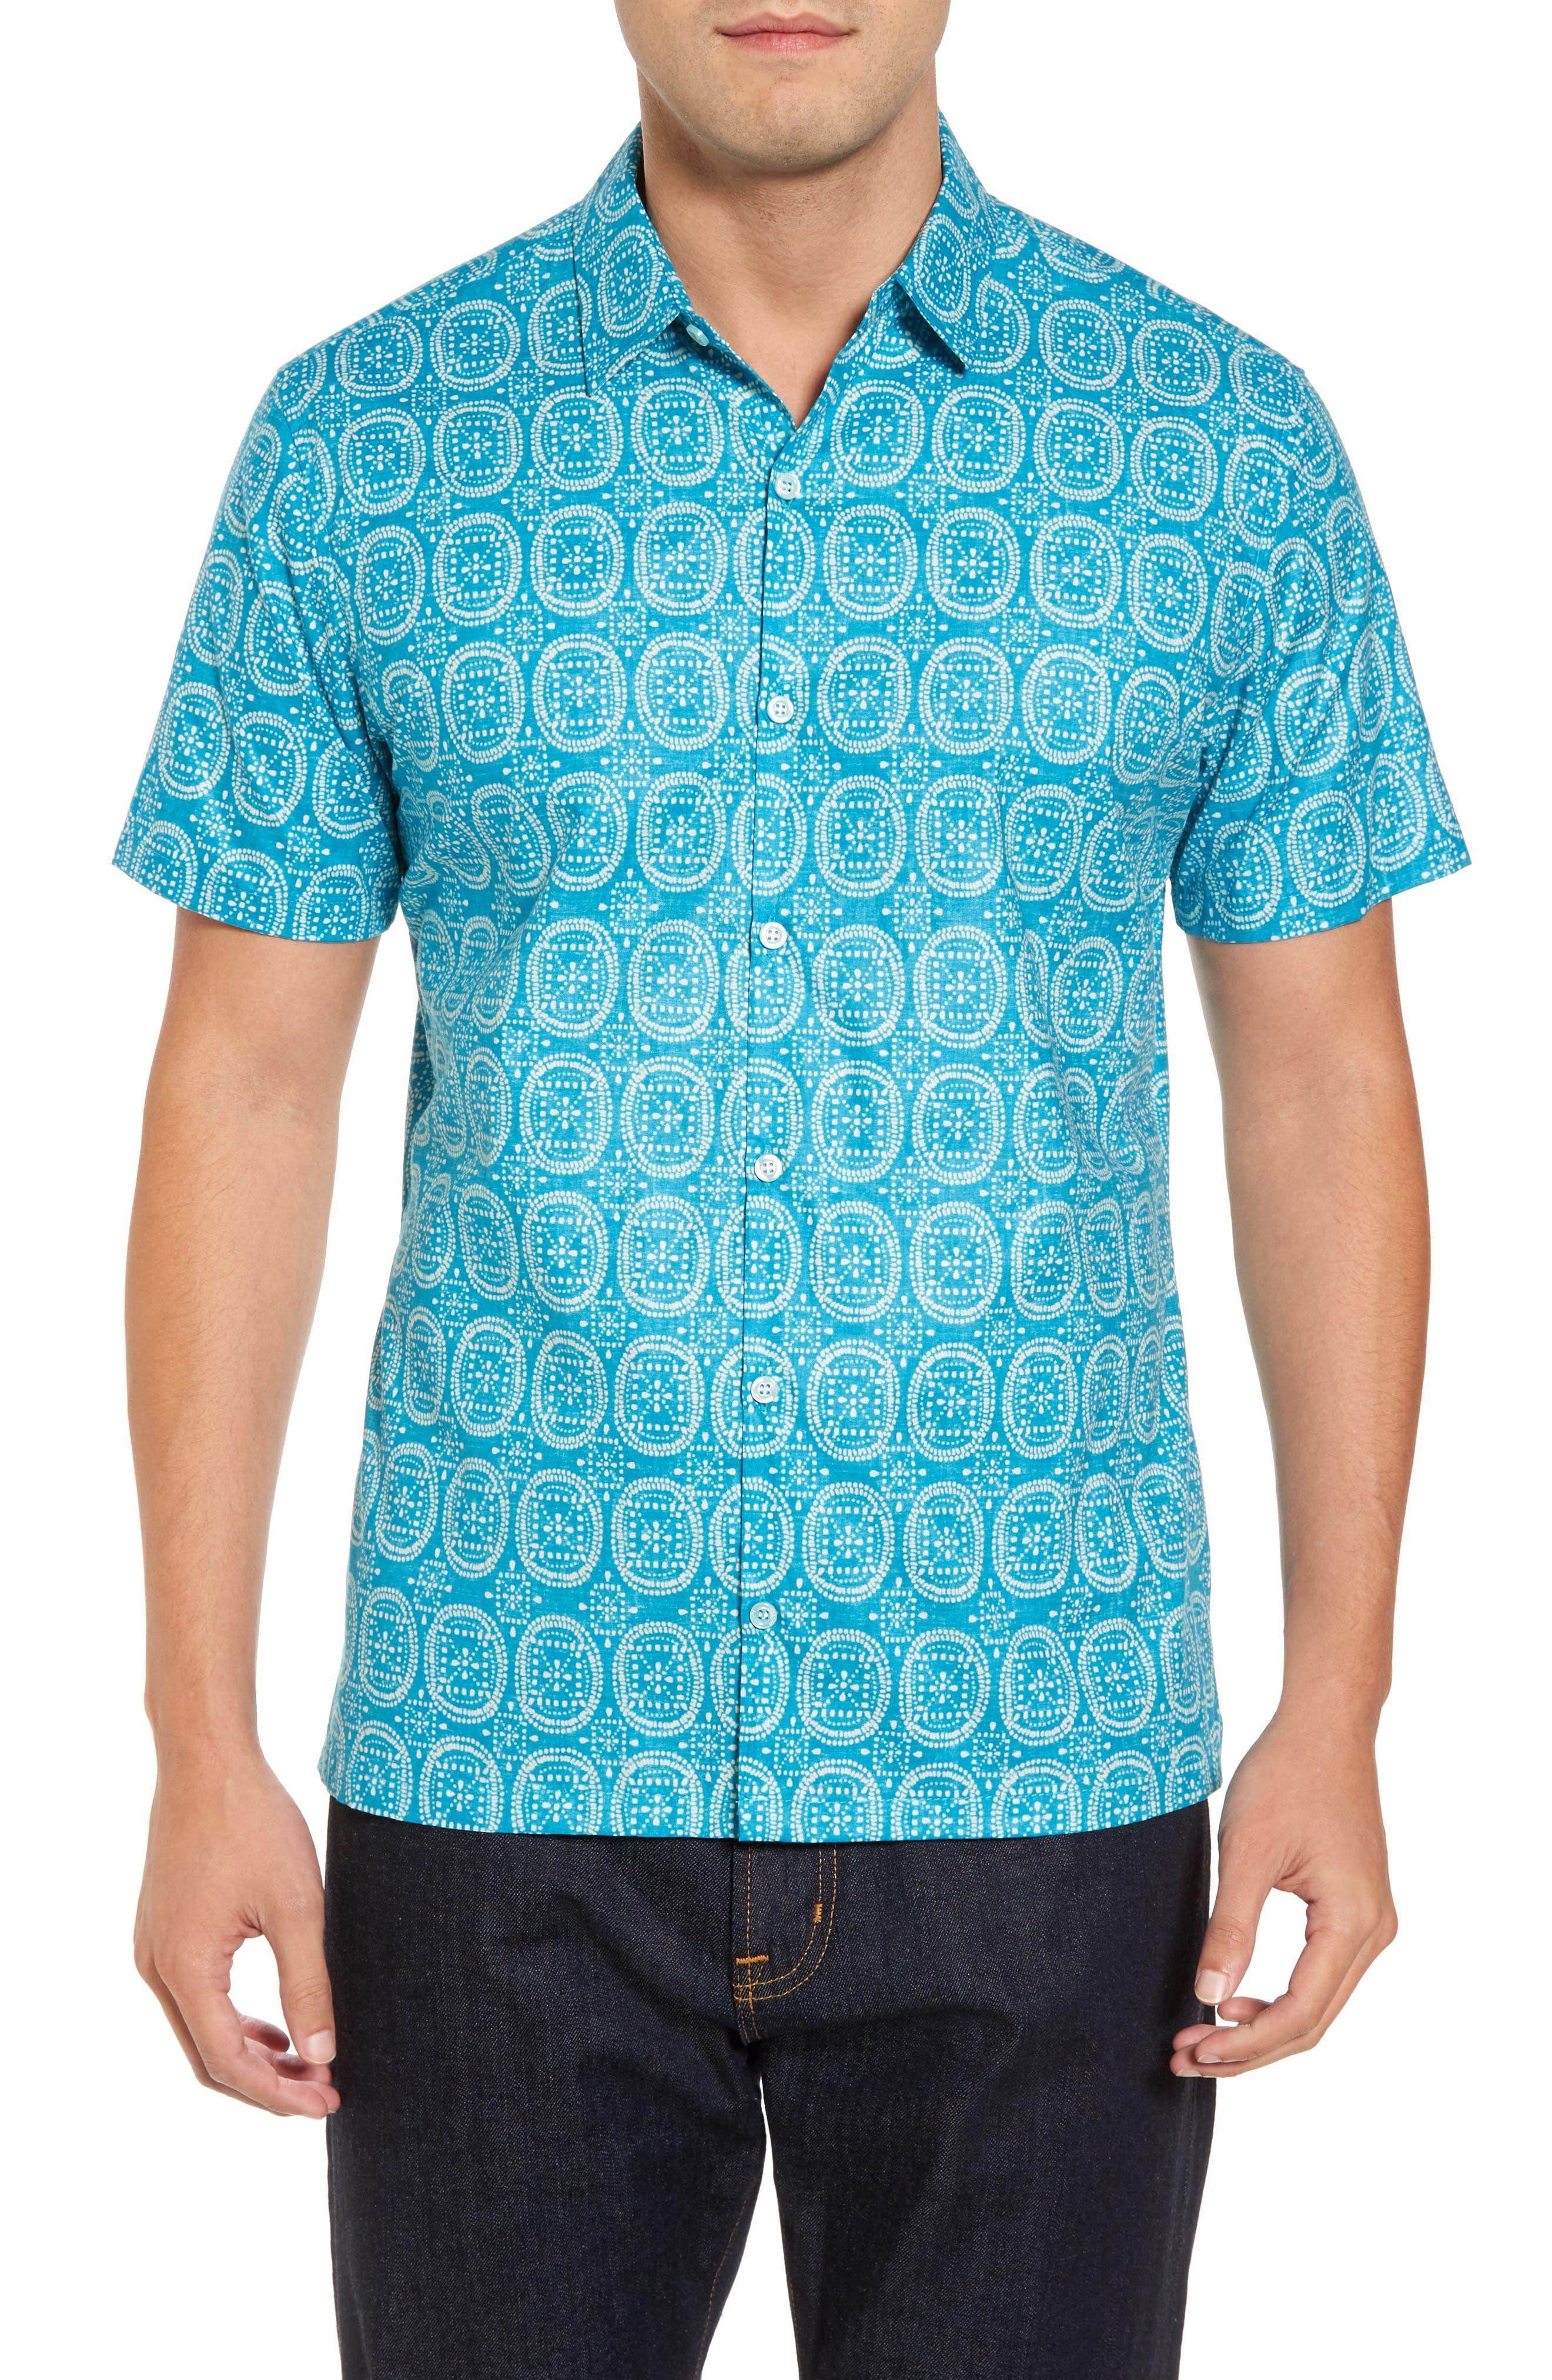 Alternate Image 1 Selected - Tori Richard Sea Biscuits Trim Fit Print Sport Shirt